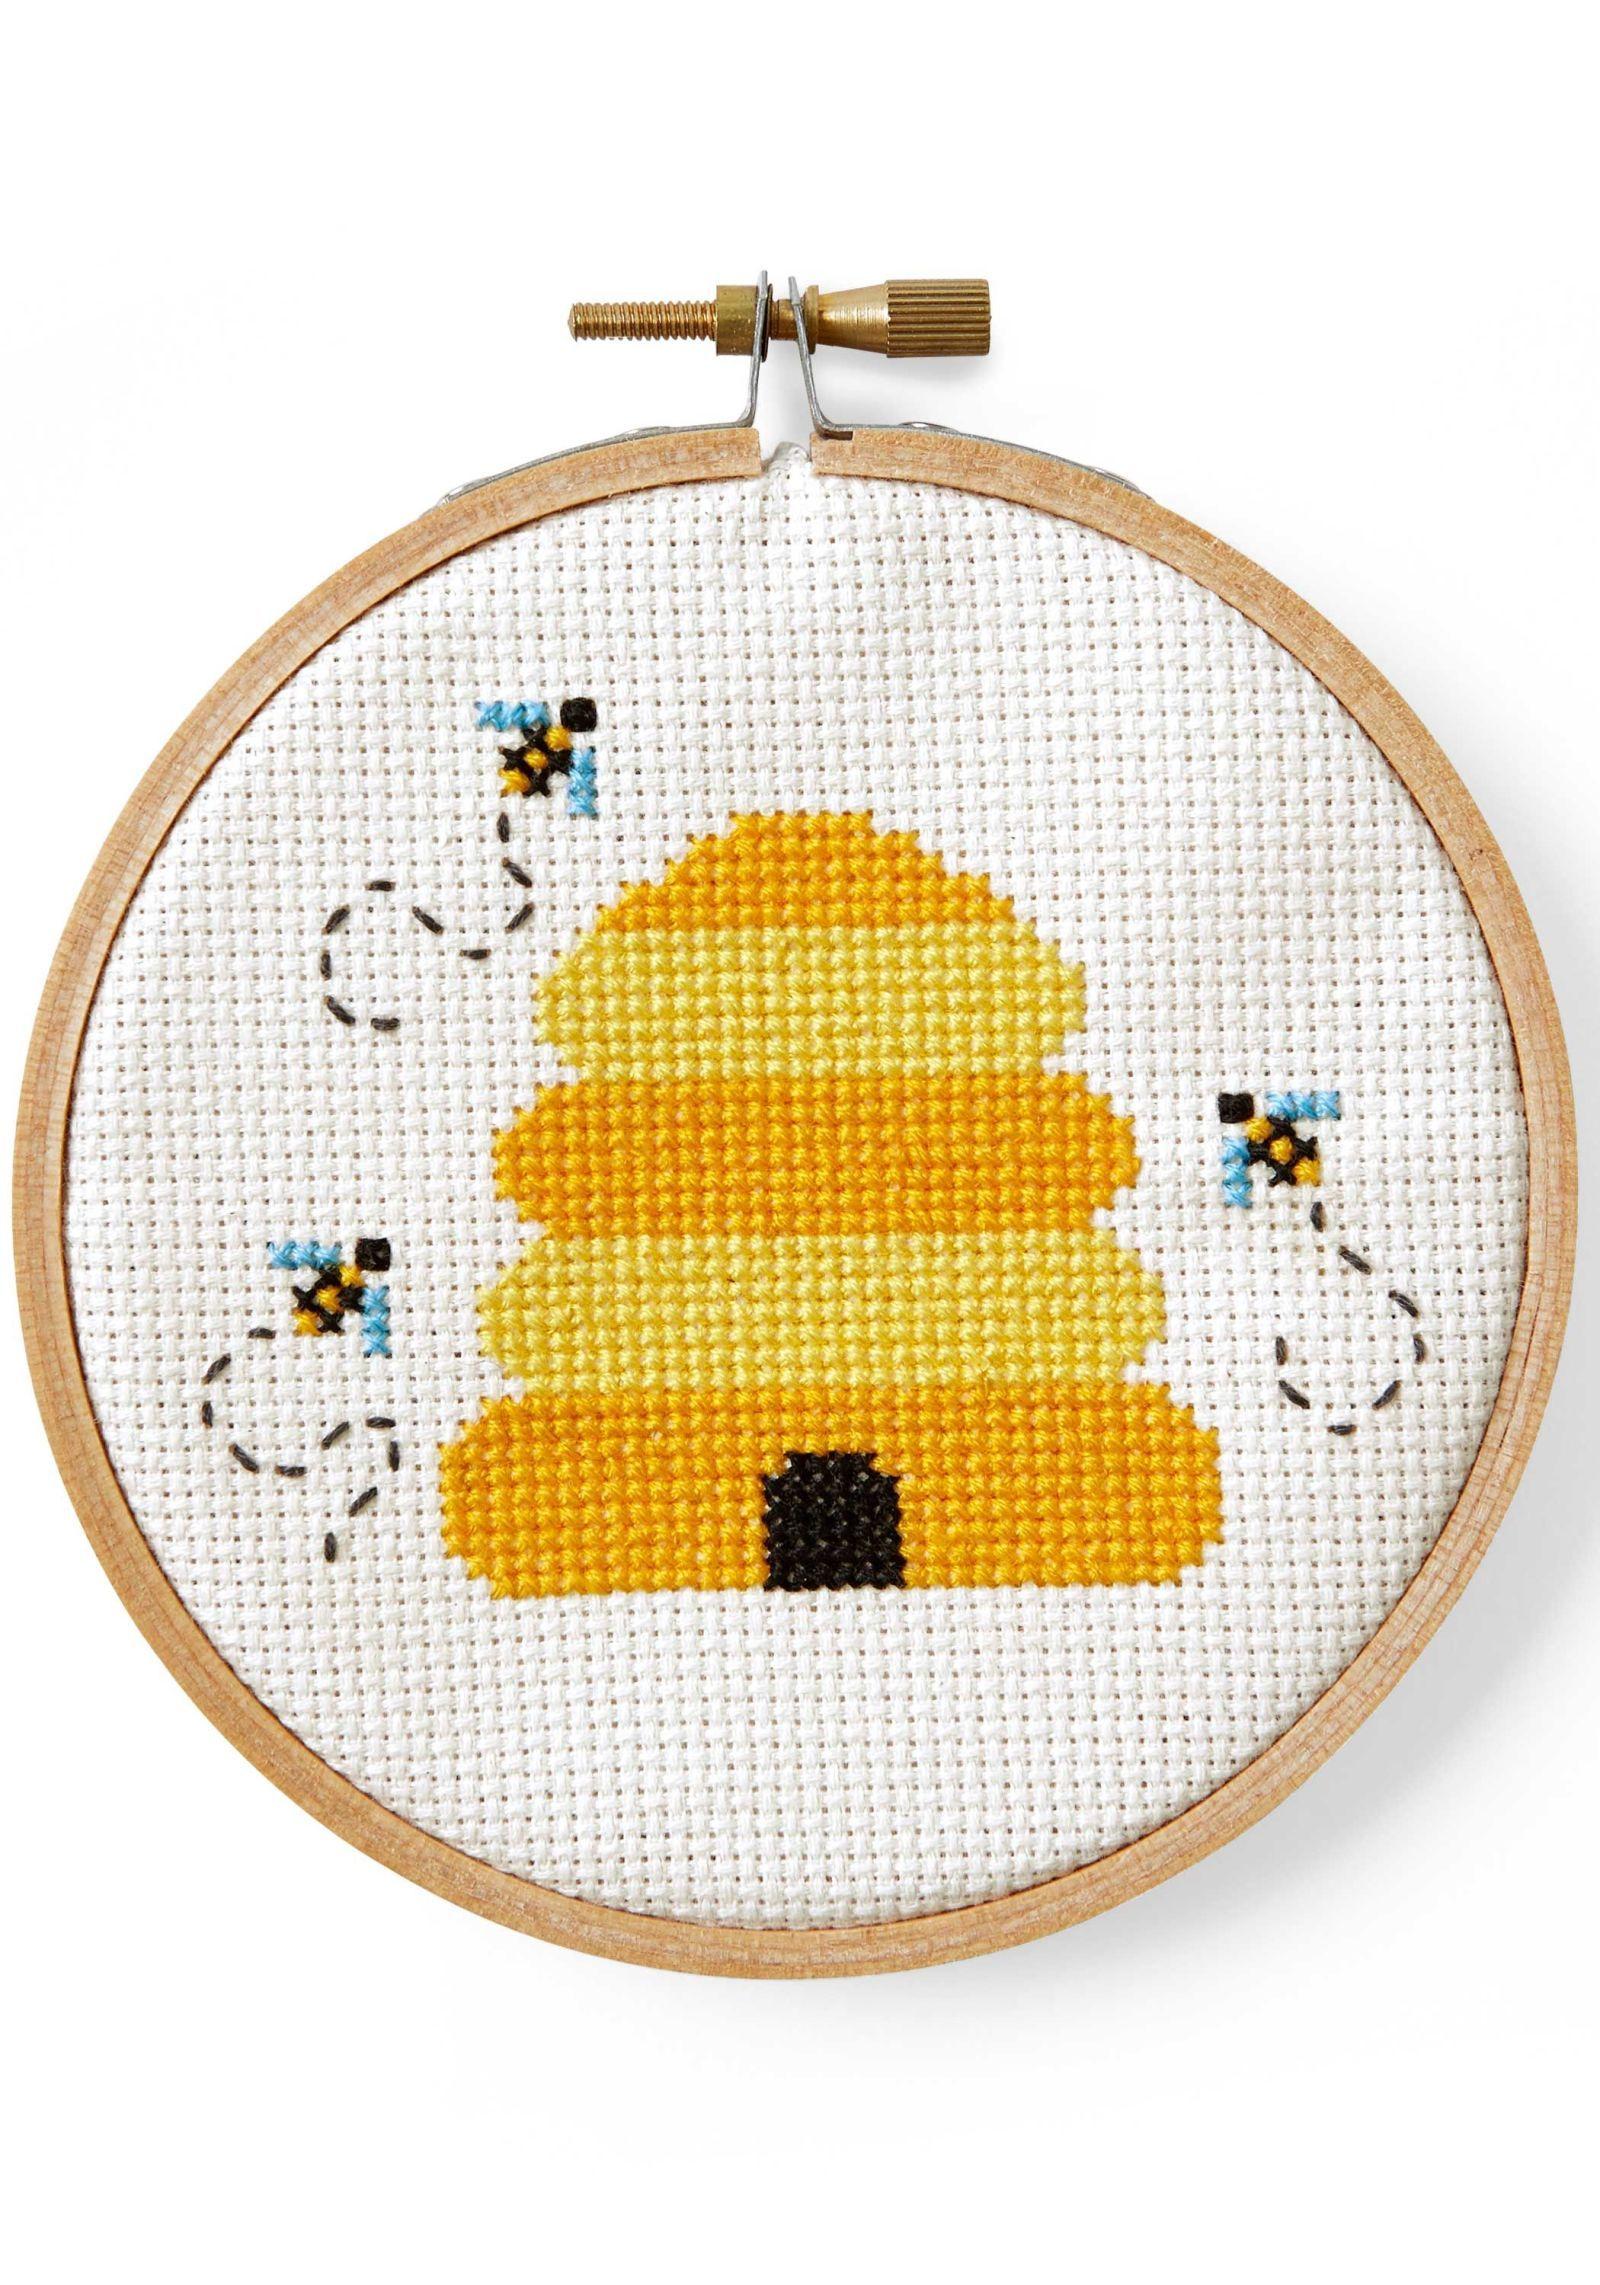 Free Cross Stitch Patterns | Craft Crack | Pinterest | Modern Cross - Free Printable Modern Cross Stitch Patterns